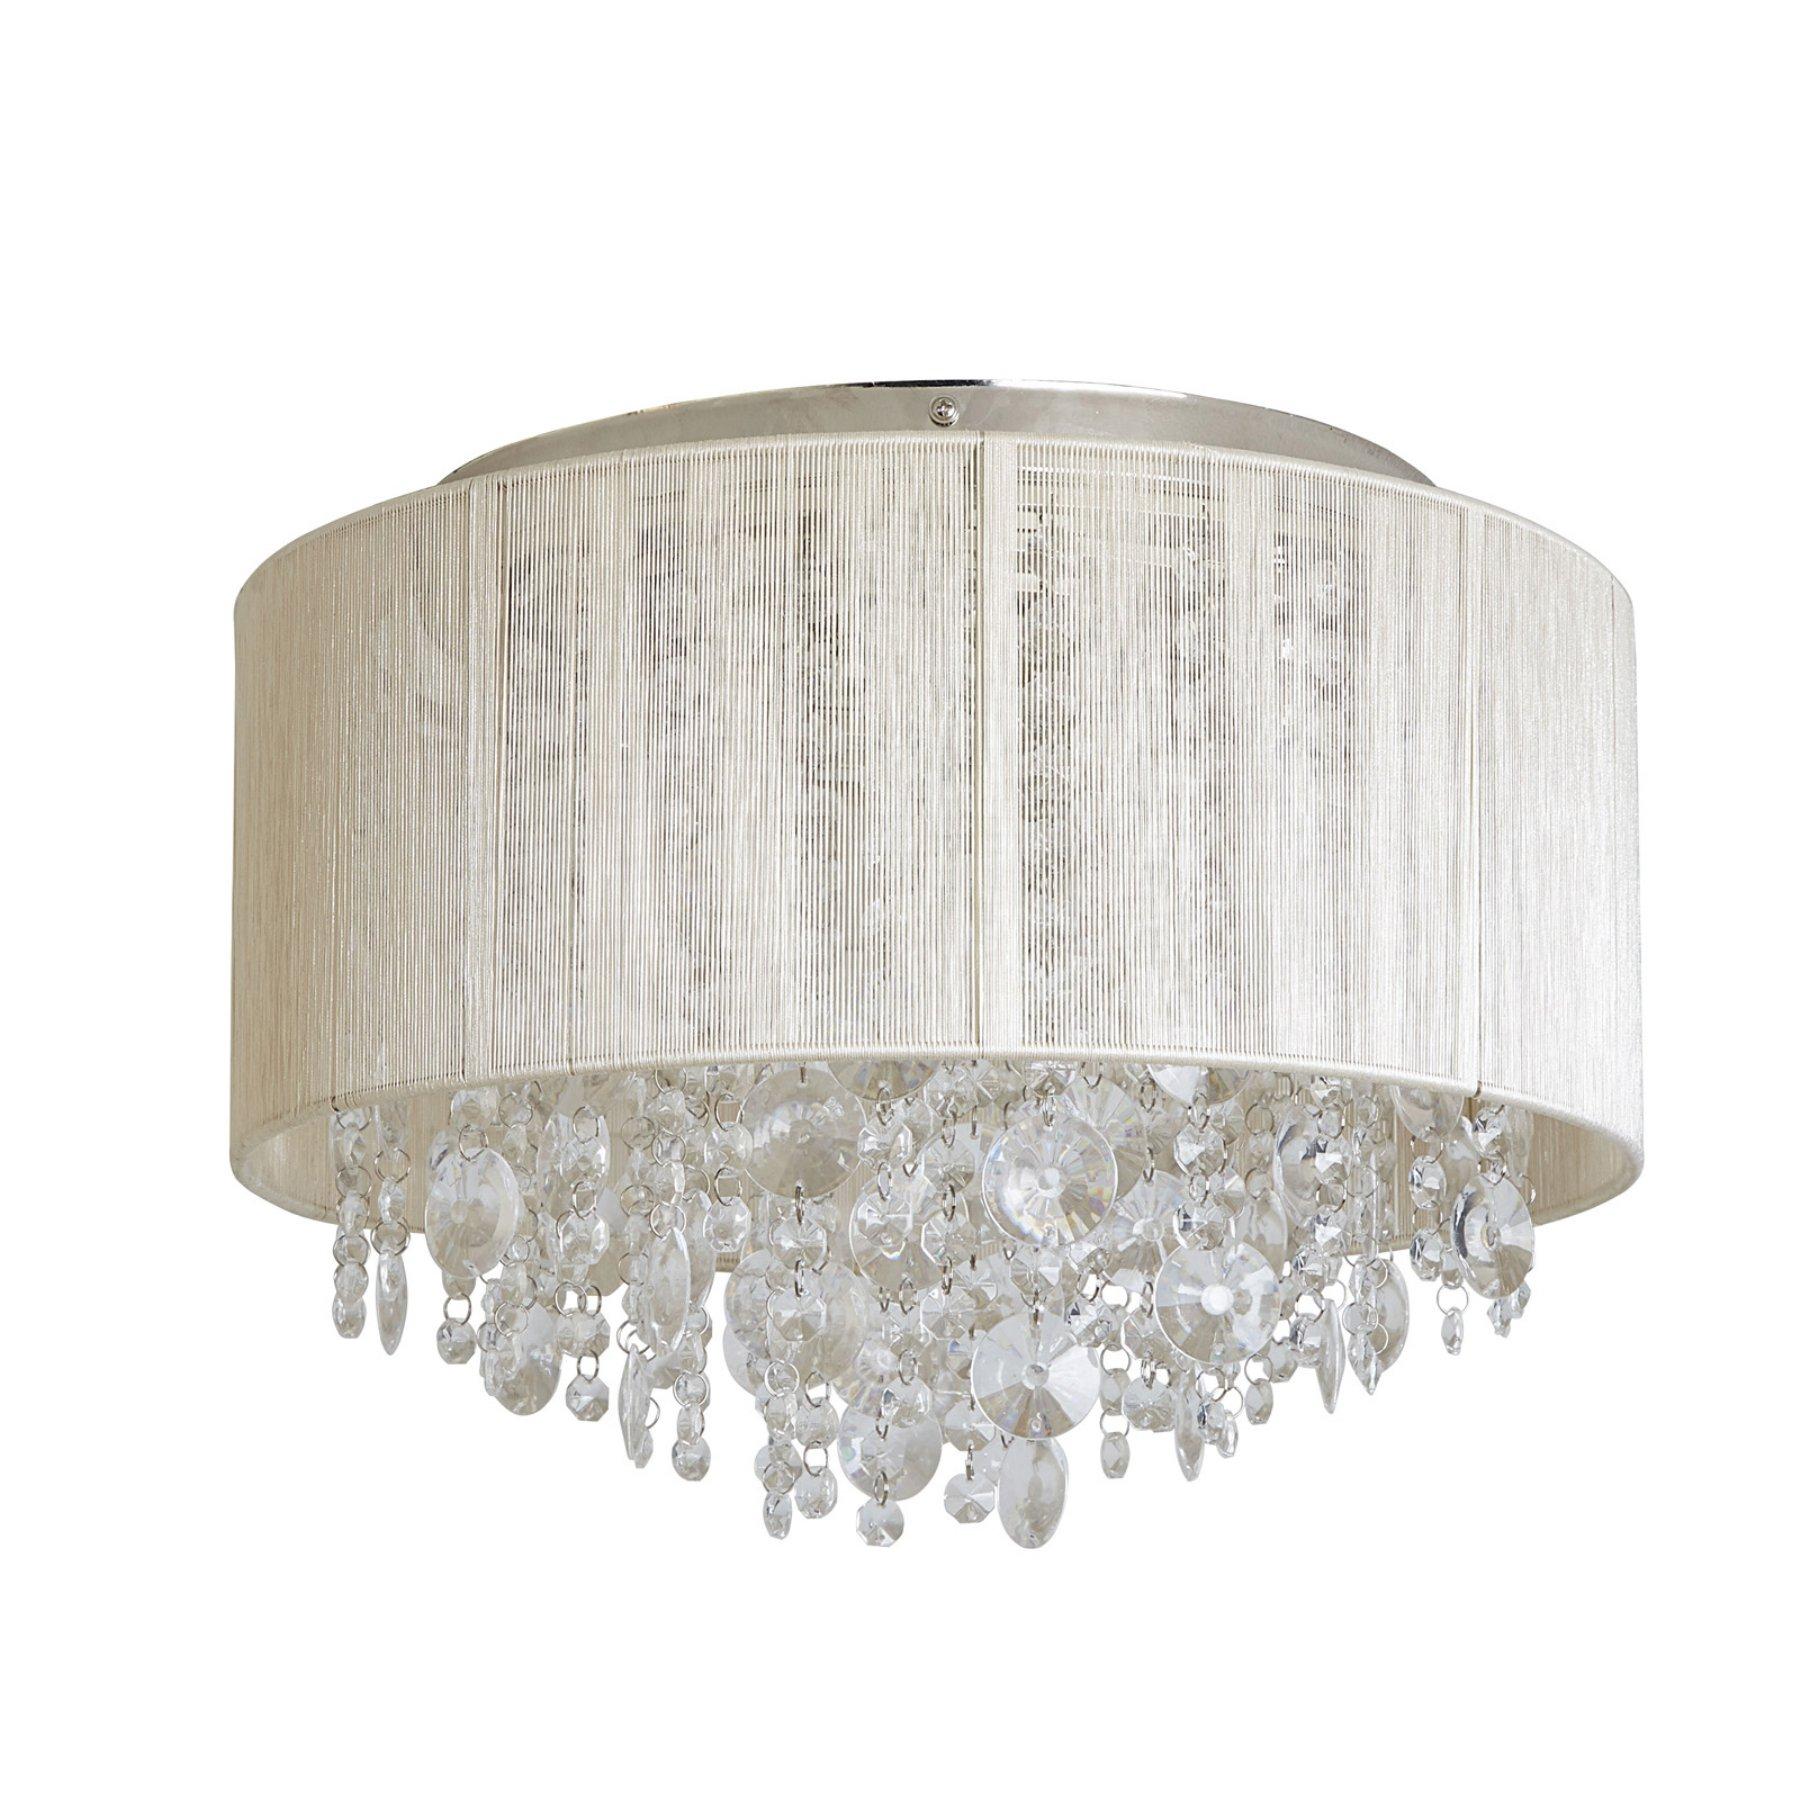 "Renaissance 16/"" Wide Polished Nickel LED Picture Light"